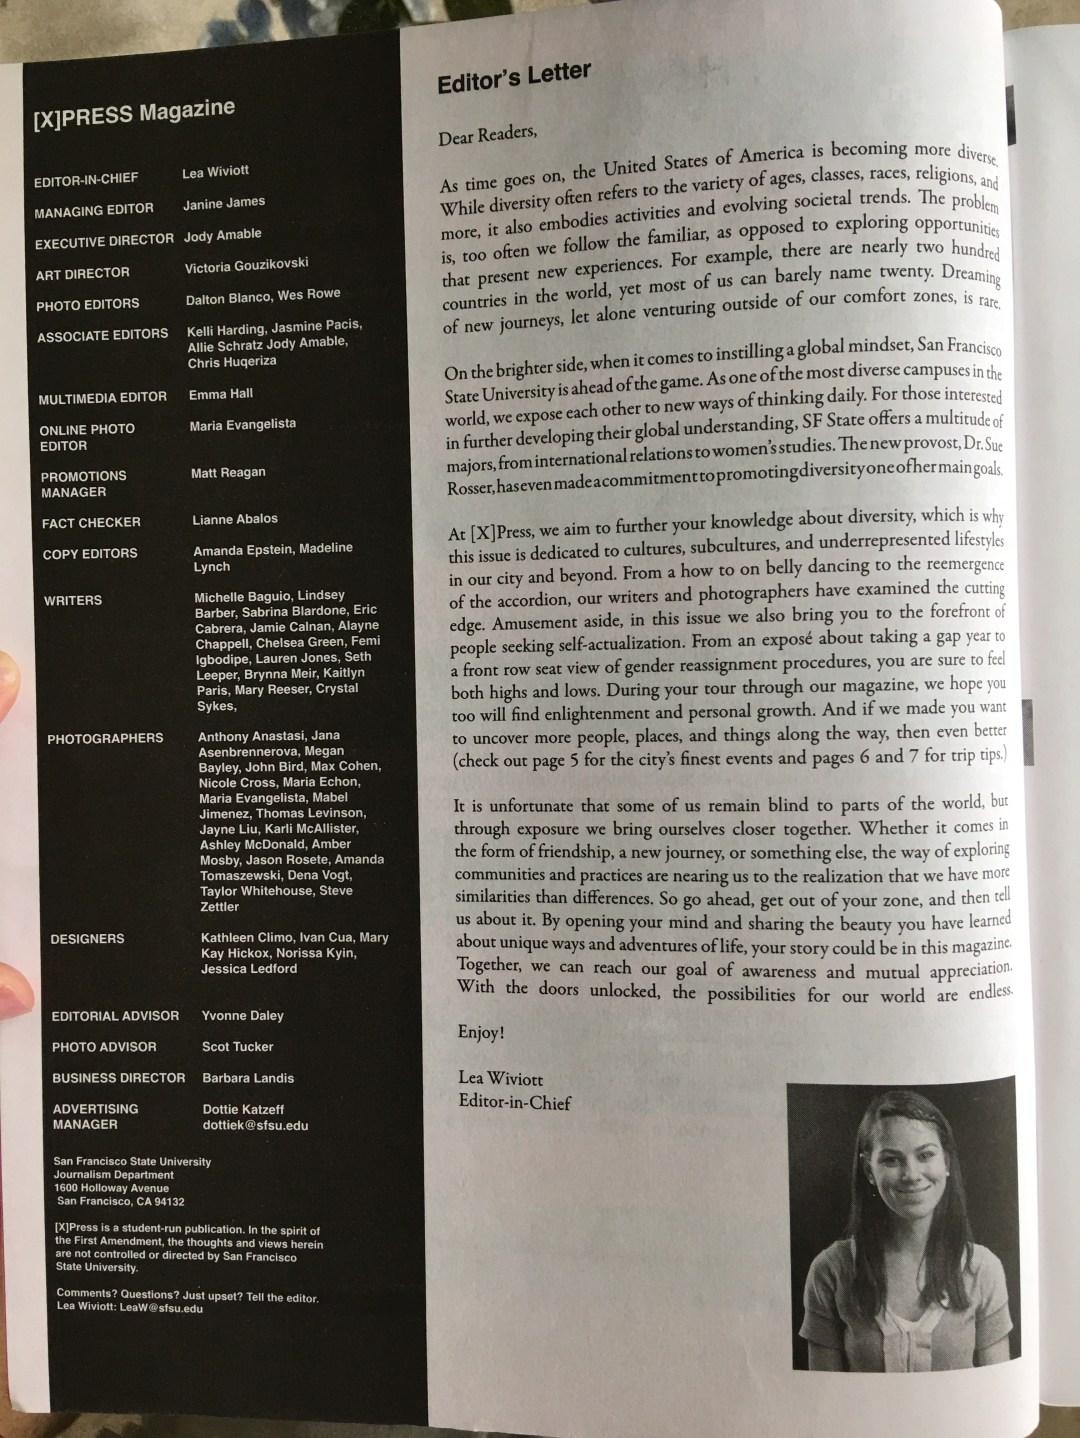 editors-letter-diversity-issue.jpg